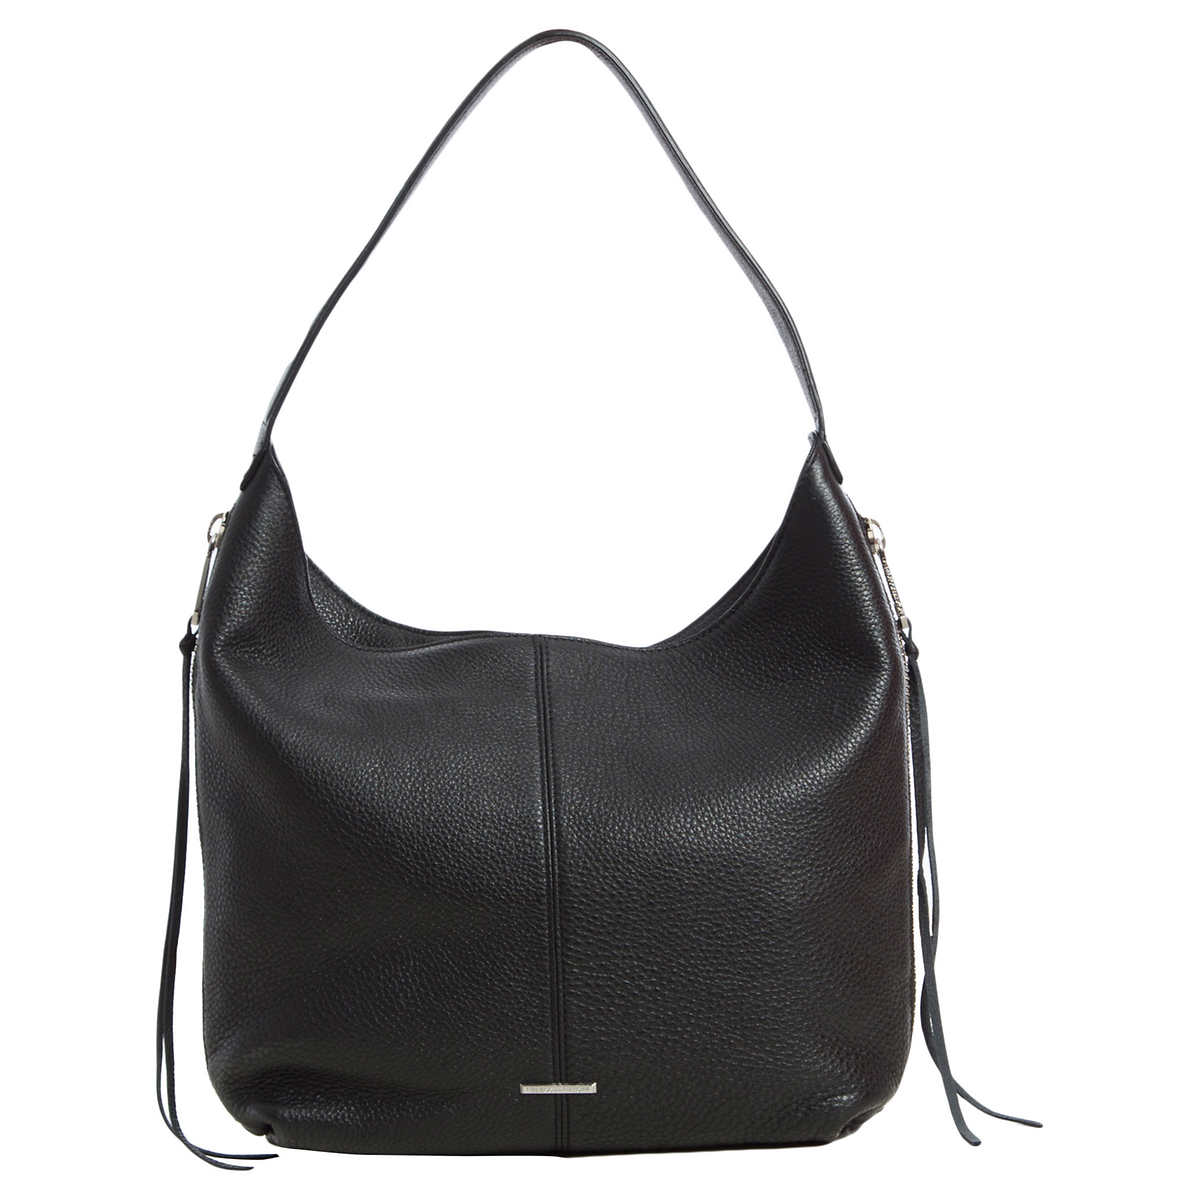 4fb4c1b73 ... Rebecca Minkoff Medium Bryn Double Zip Hobo Bag, Black. 1 1